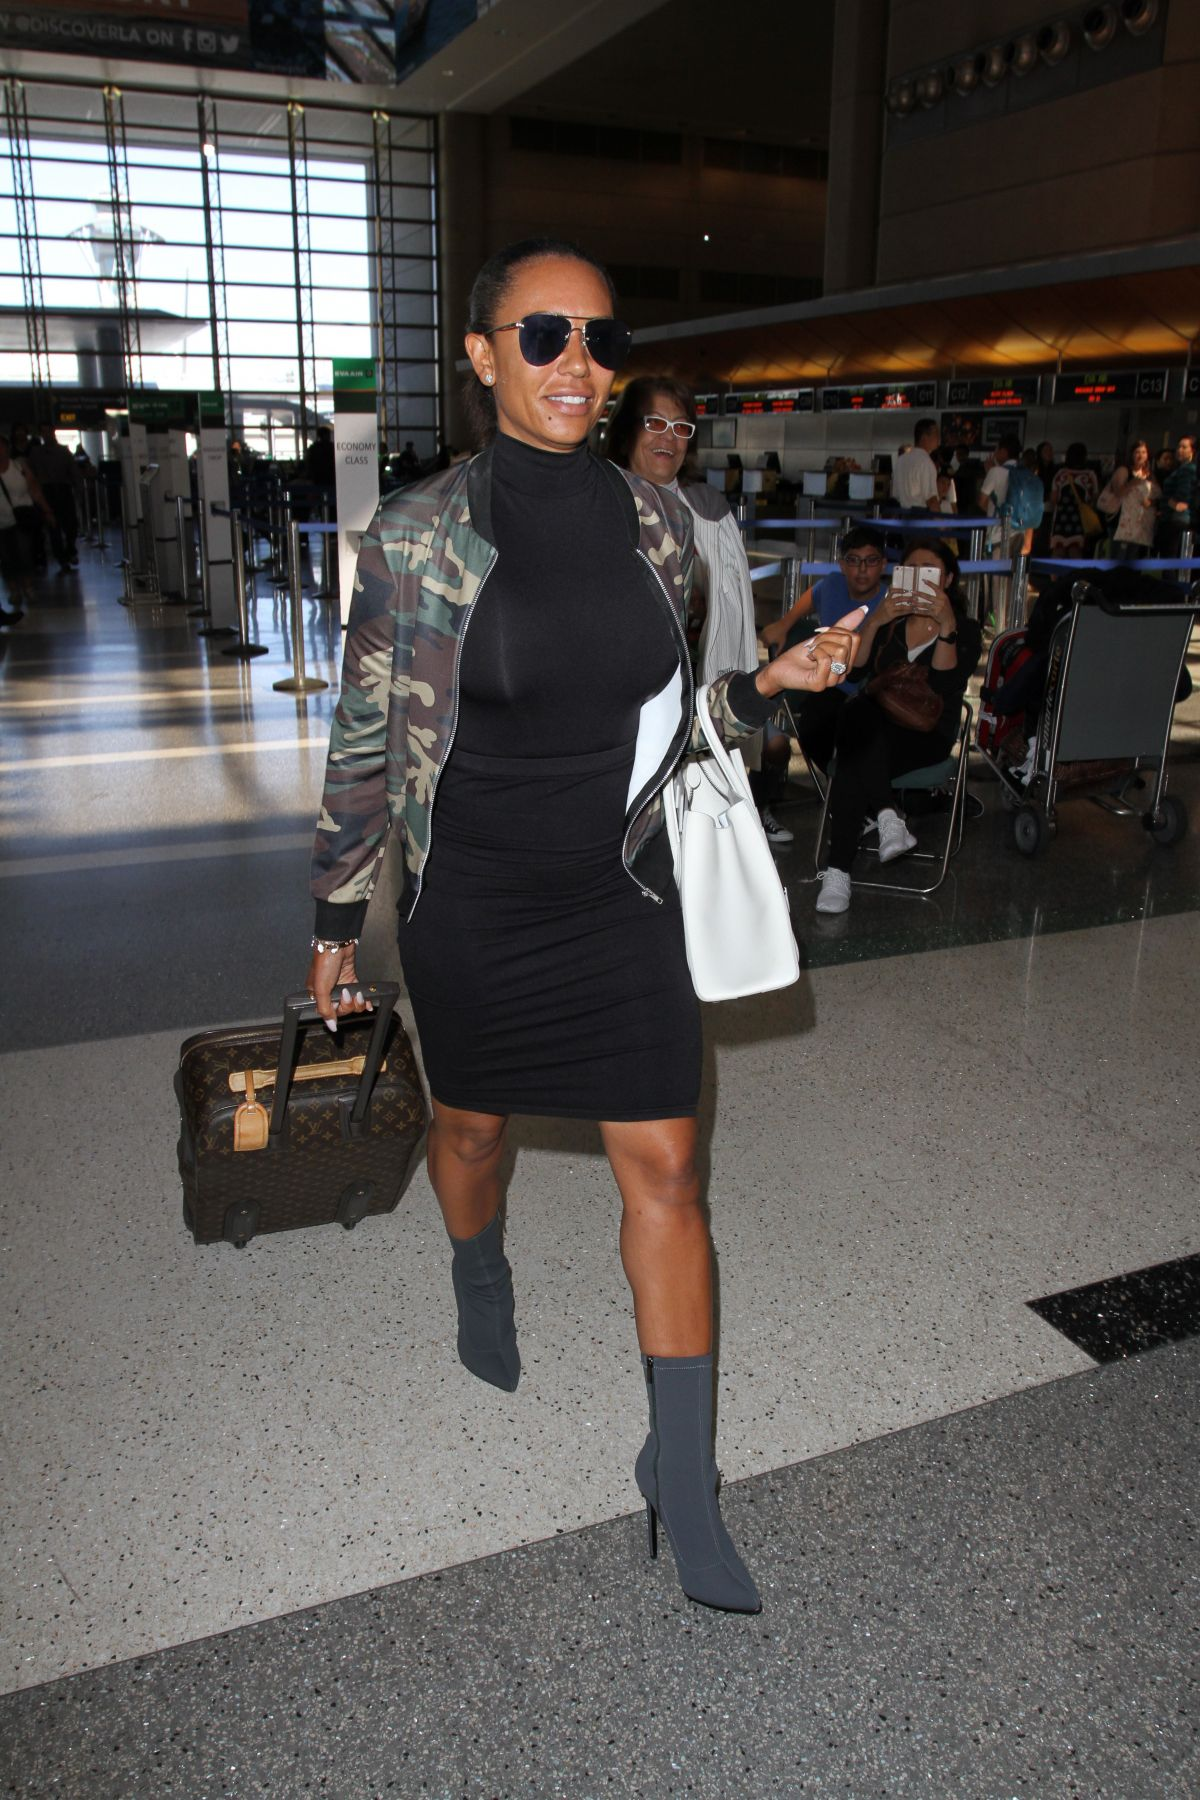 MELANIE BROWN at LAX Airport in Los Angeles 06/16/2016